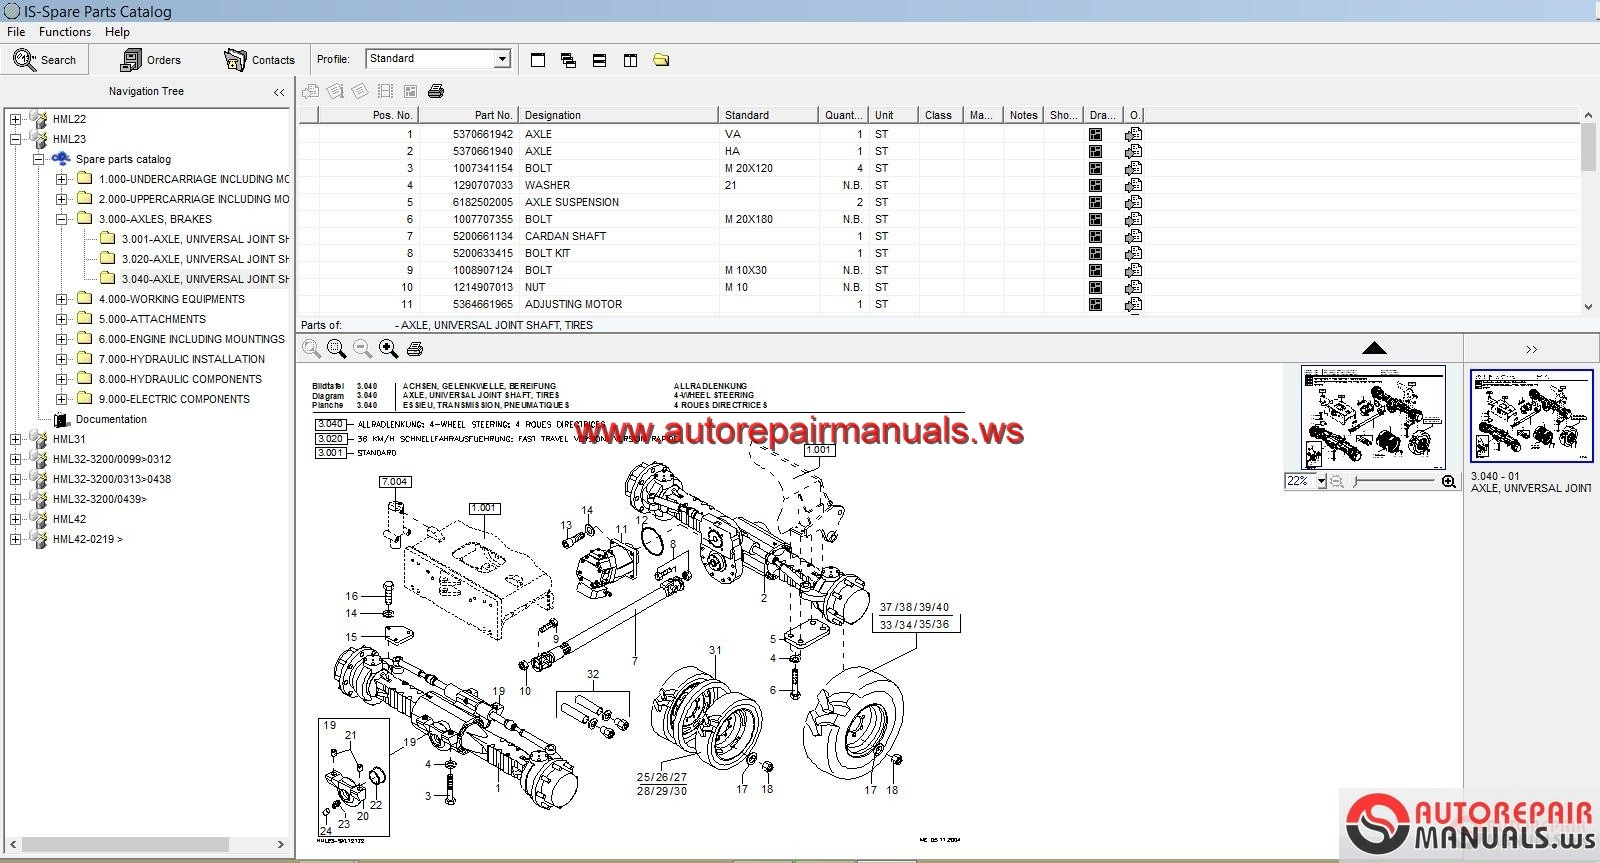 Free Auto Repair Manual Schaeff Terex Parts Catalogue Full